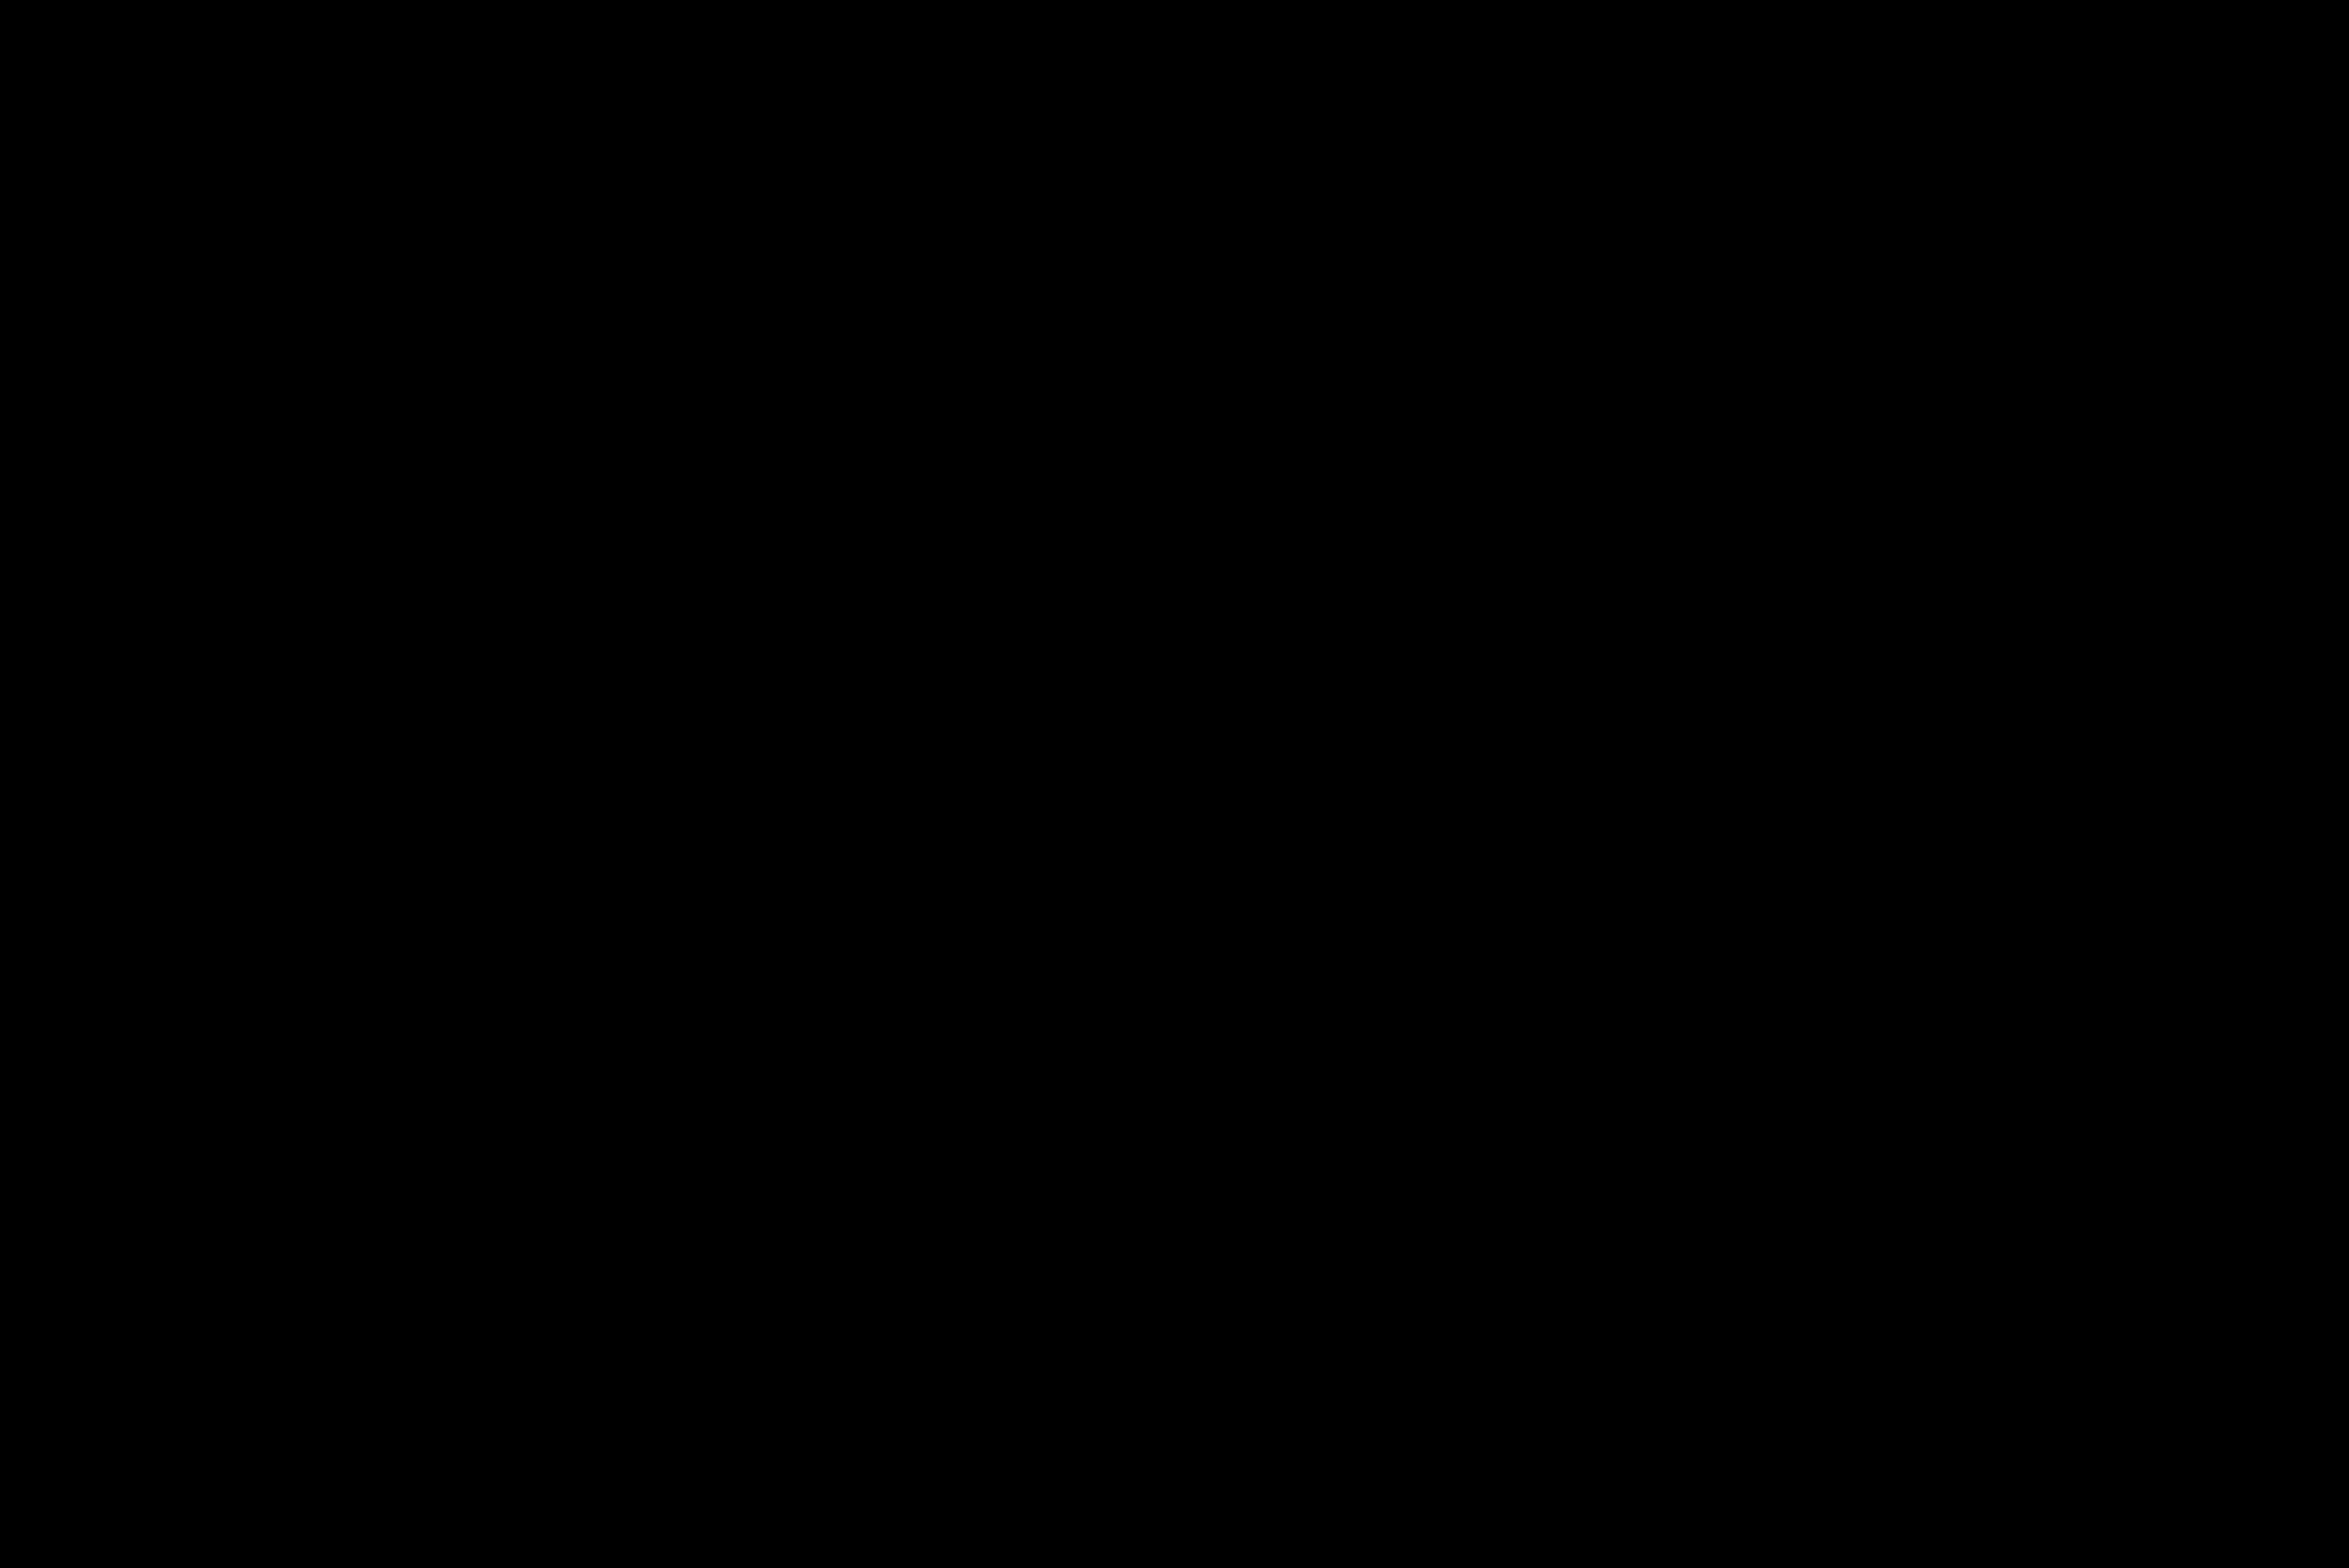 OKOBOJI LIGHTS DESIGNER PILLOW